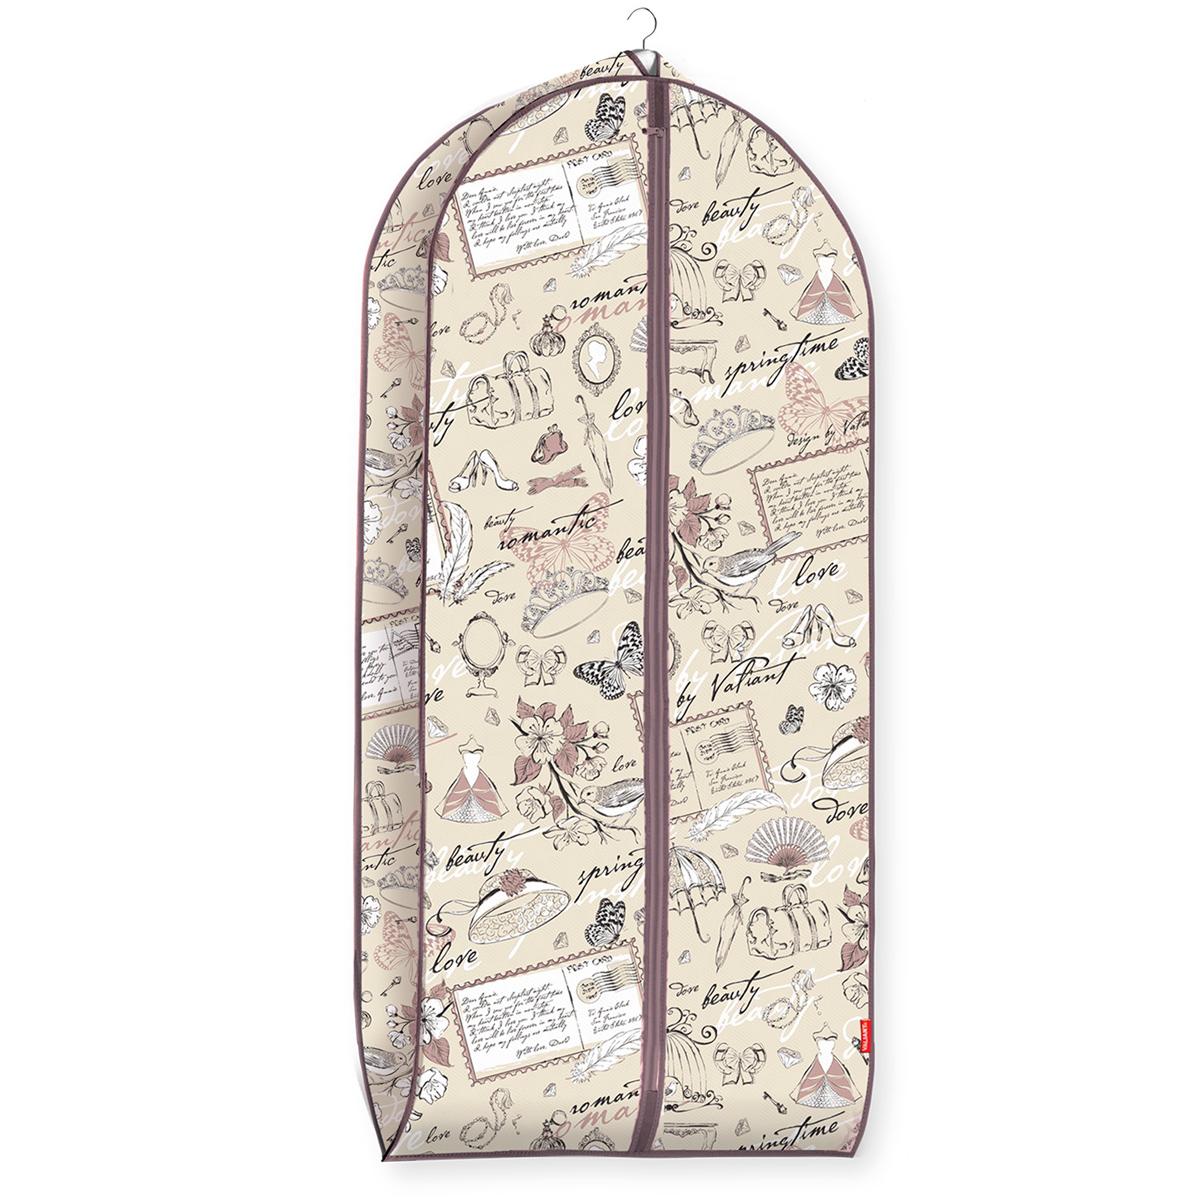 Чехол для одежды Valiant Romantic, объемный, 60 см х 137 см х 10 см чехол для одежды valiant classic объемный 60 х 100 х 10 см